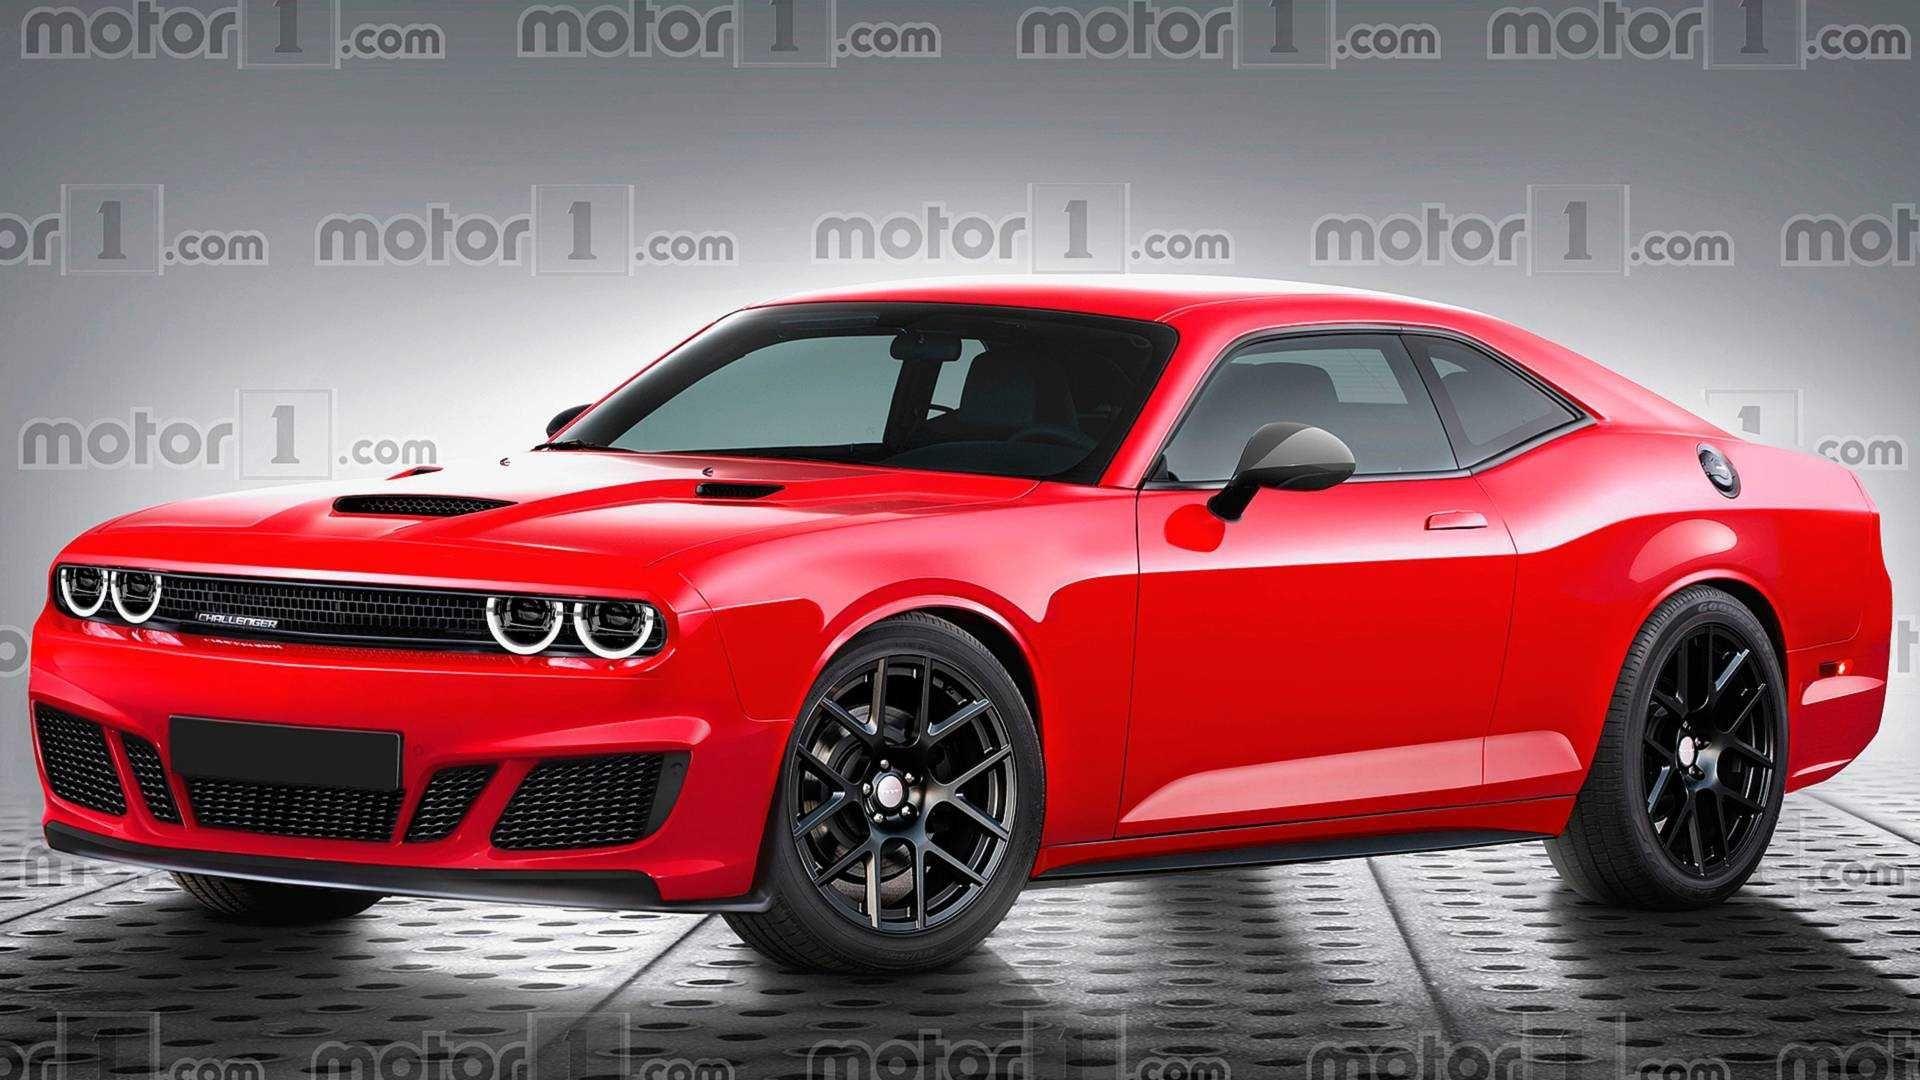 Dodge Fashions 2021 Specs In 2020 Dodge Challenger Dodge Challenger Hellcat Dodge Challenger Srt Hellcat